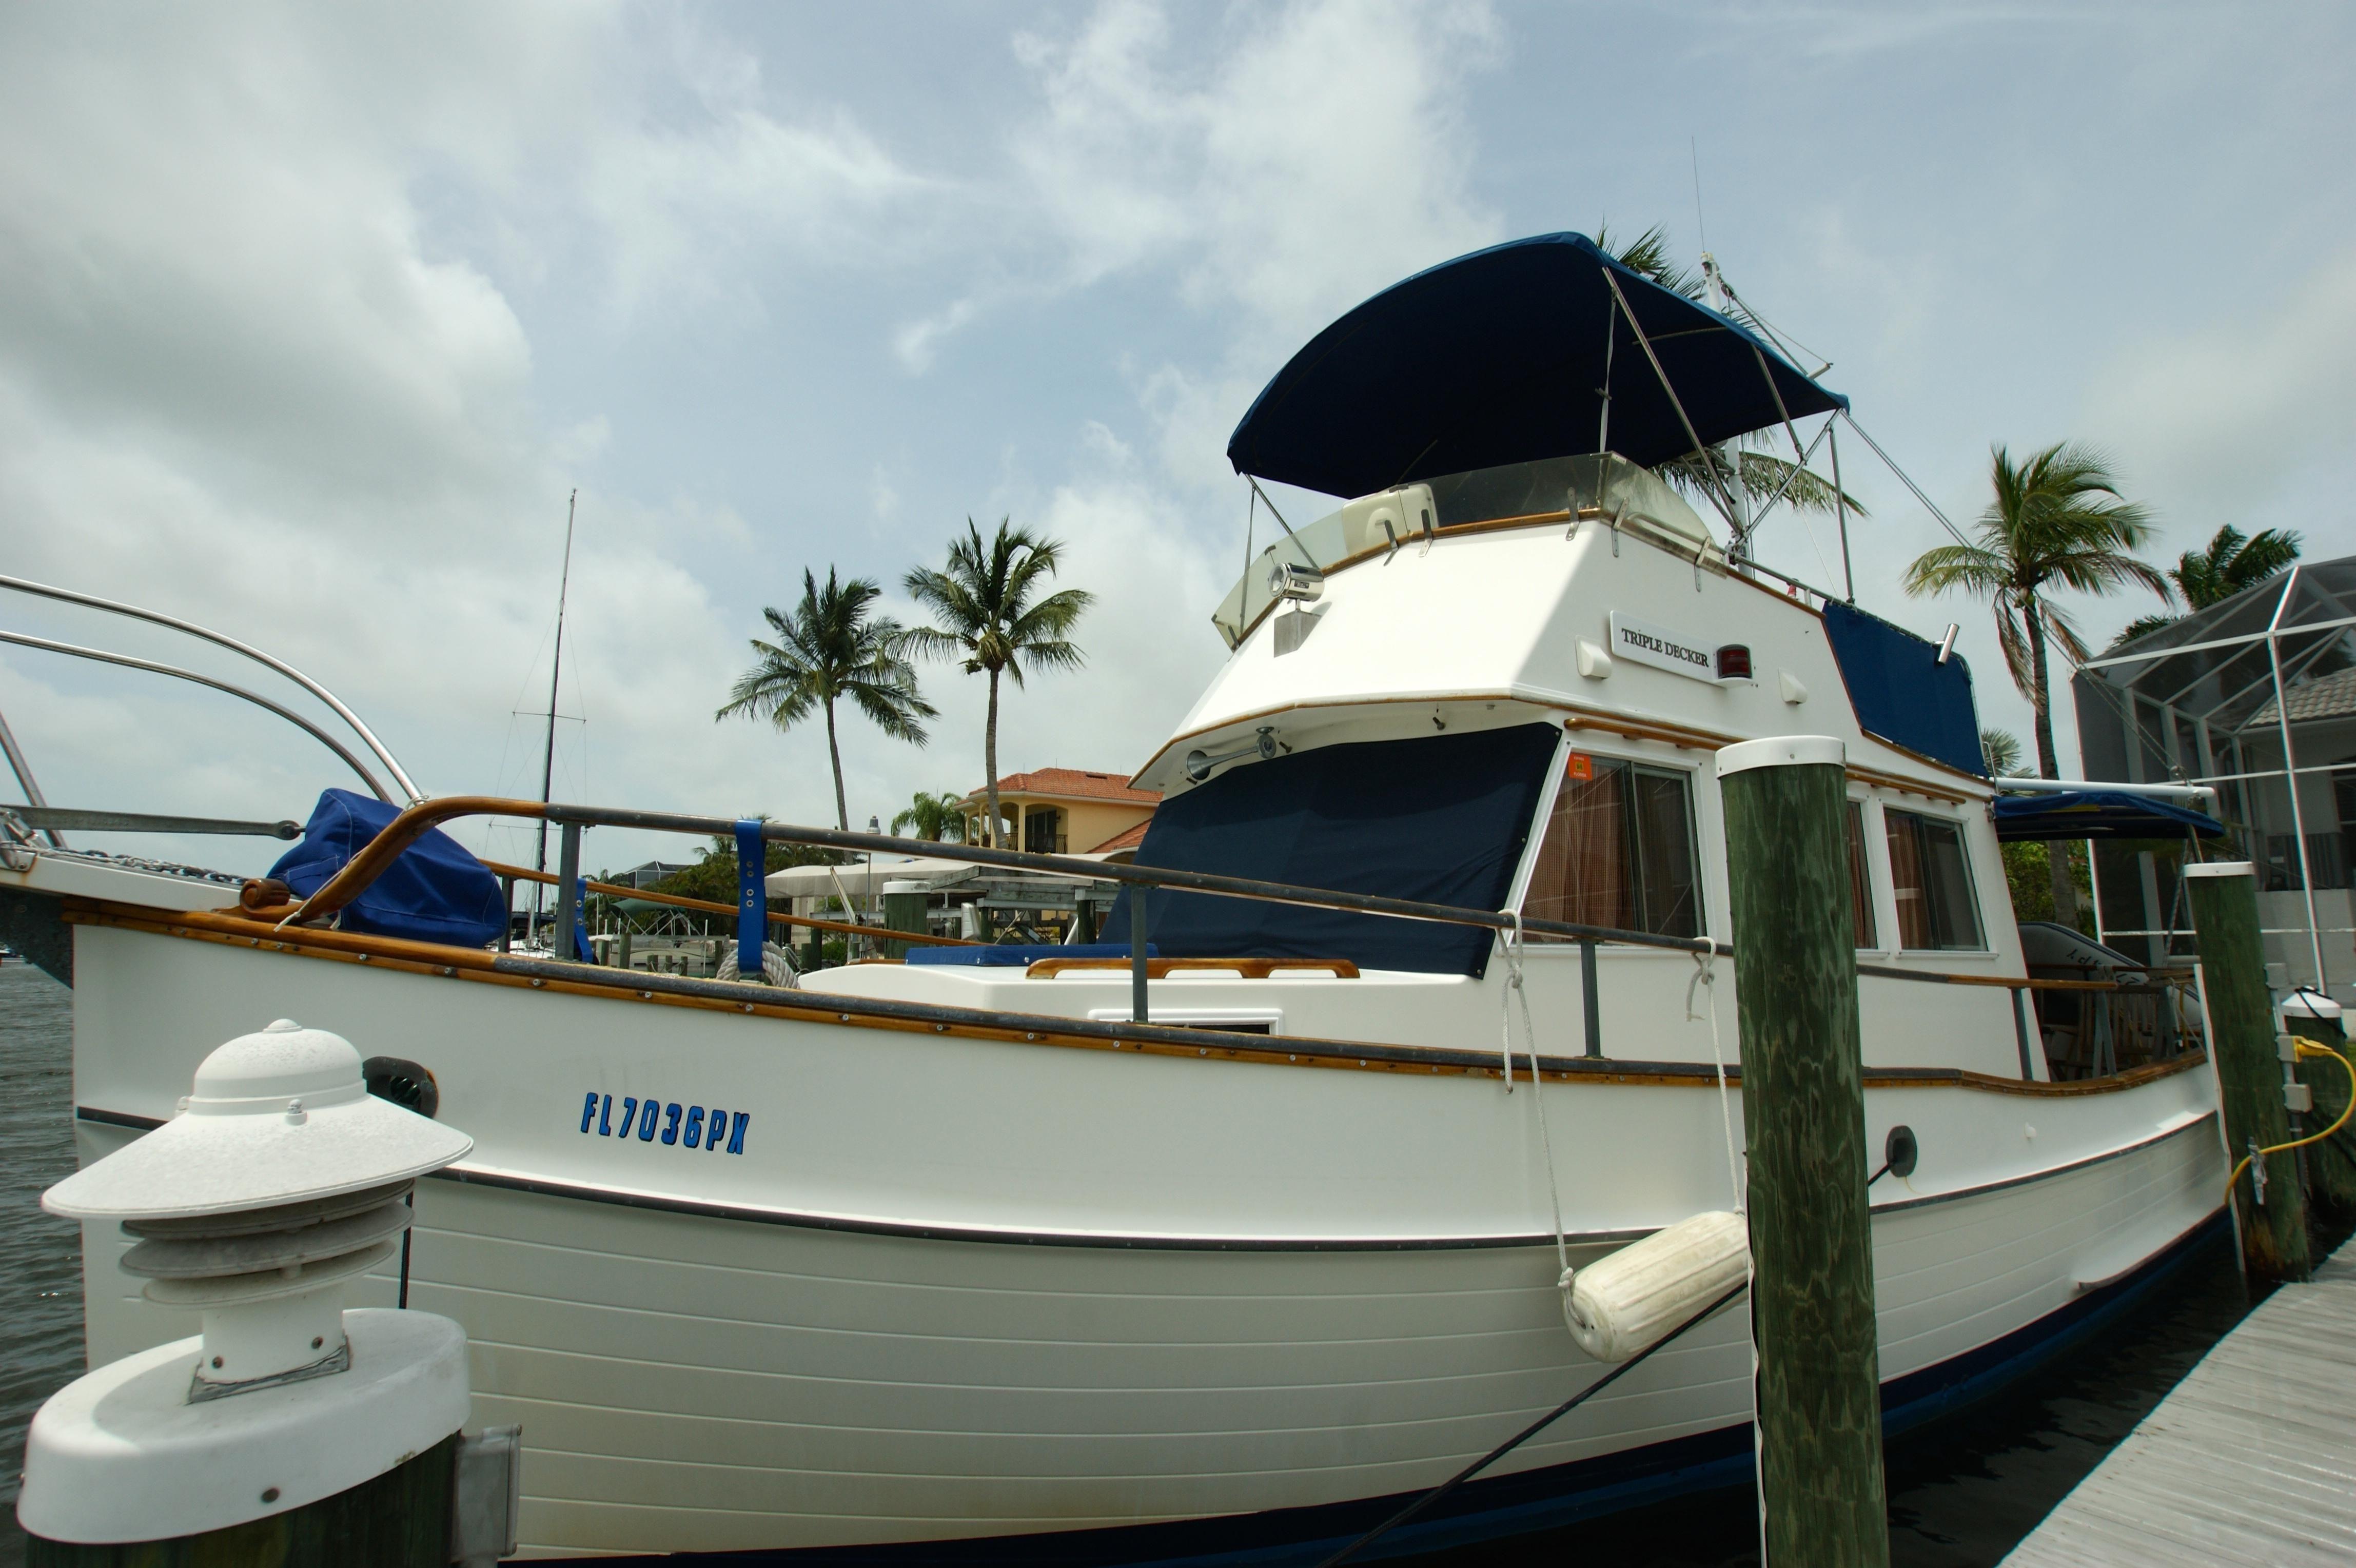 3 Year Loans >> 1988 Grand Banks 32 Sedan Power Boat For Sale - www.yachtworld.com